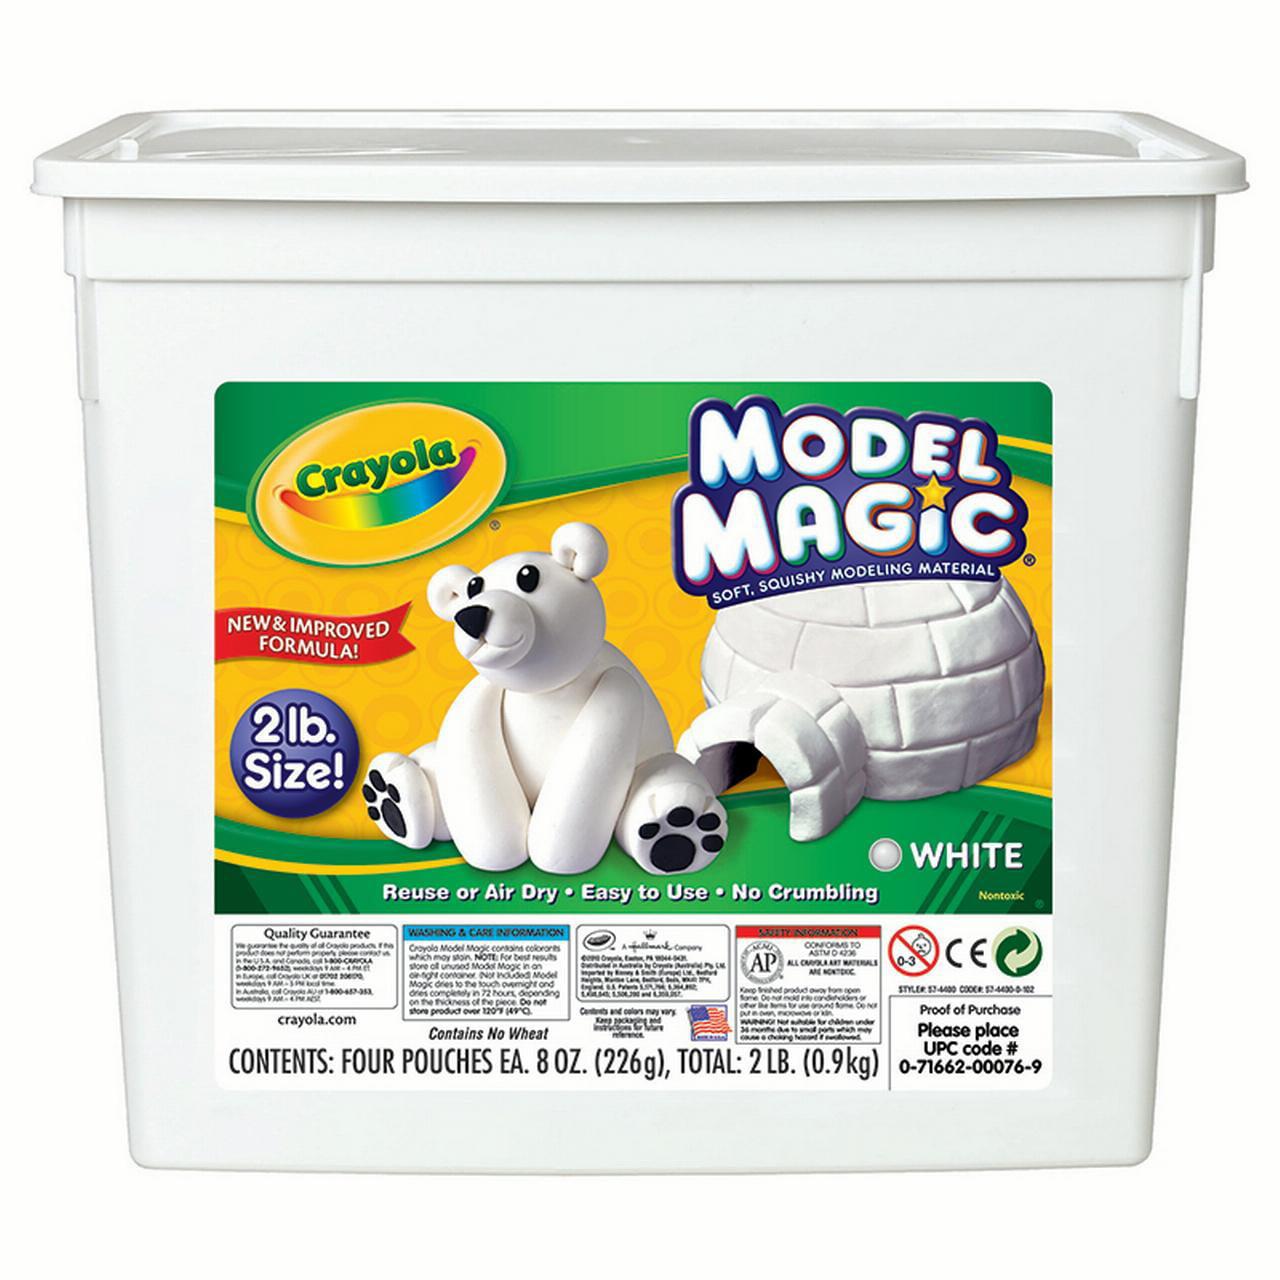 Crayola Model Magic, 2 lb Tub, White